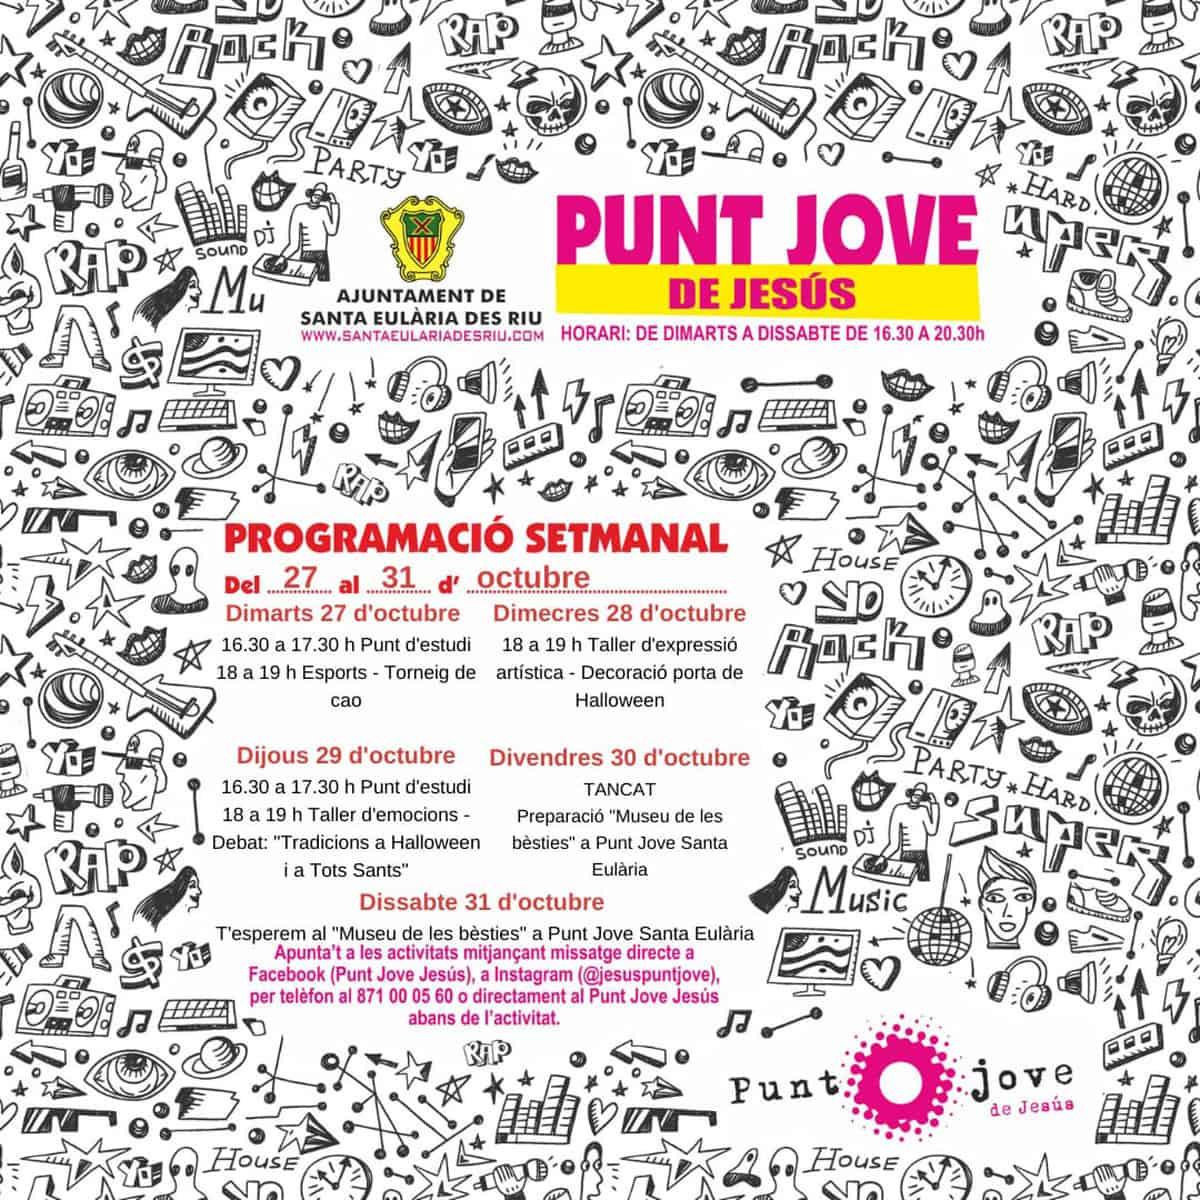 punt-jove-jesus-ibiza-2020-programa-halloween-welcometoibiza